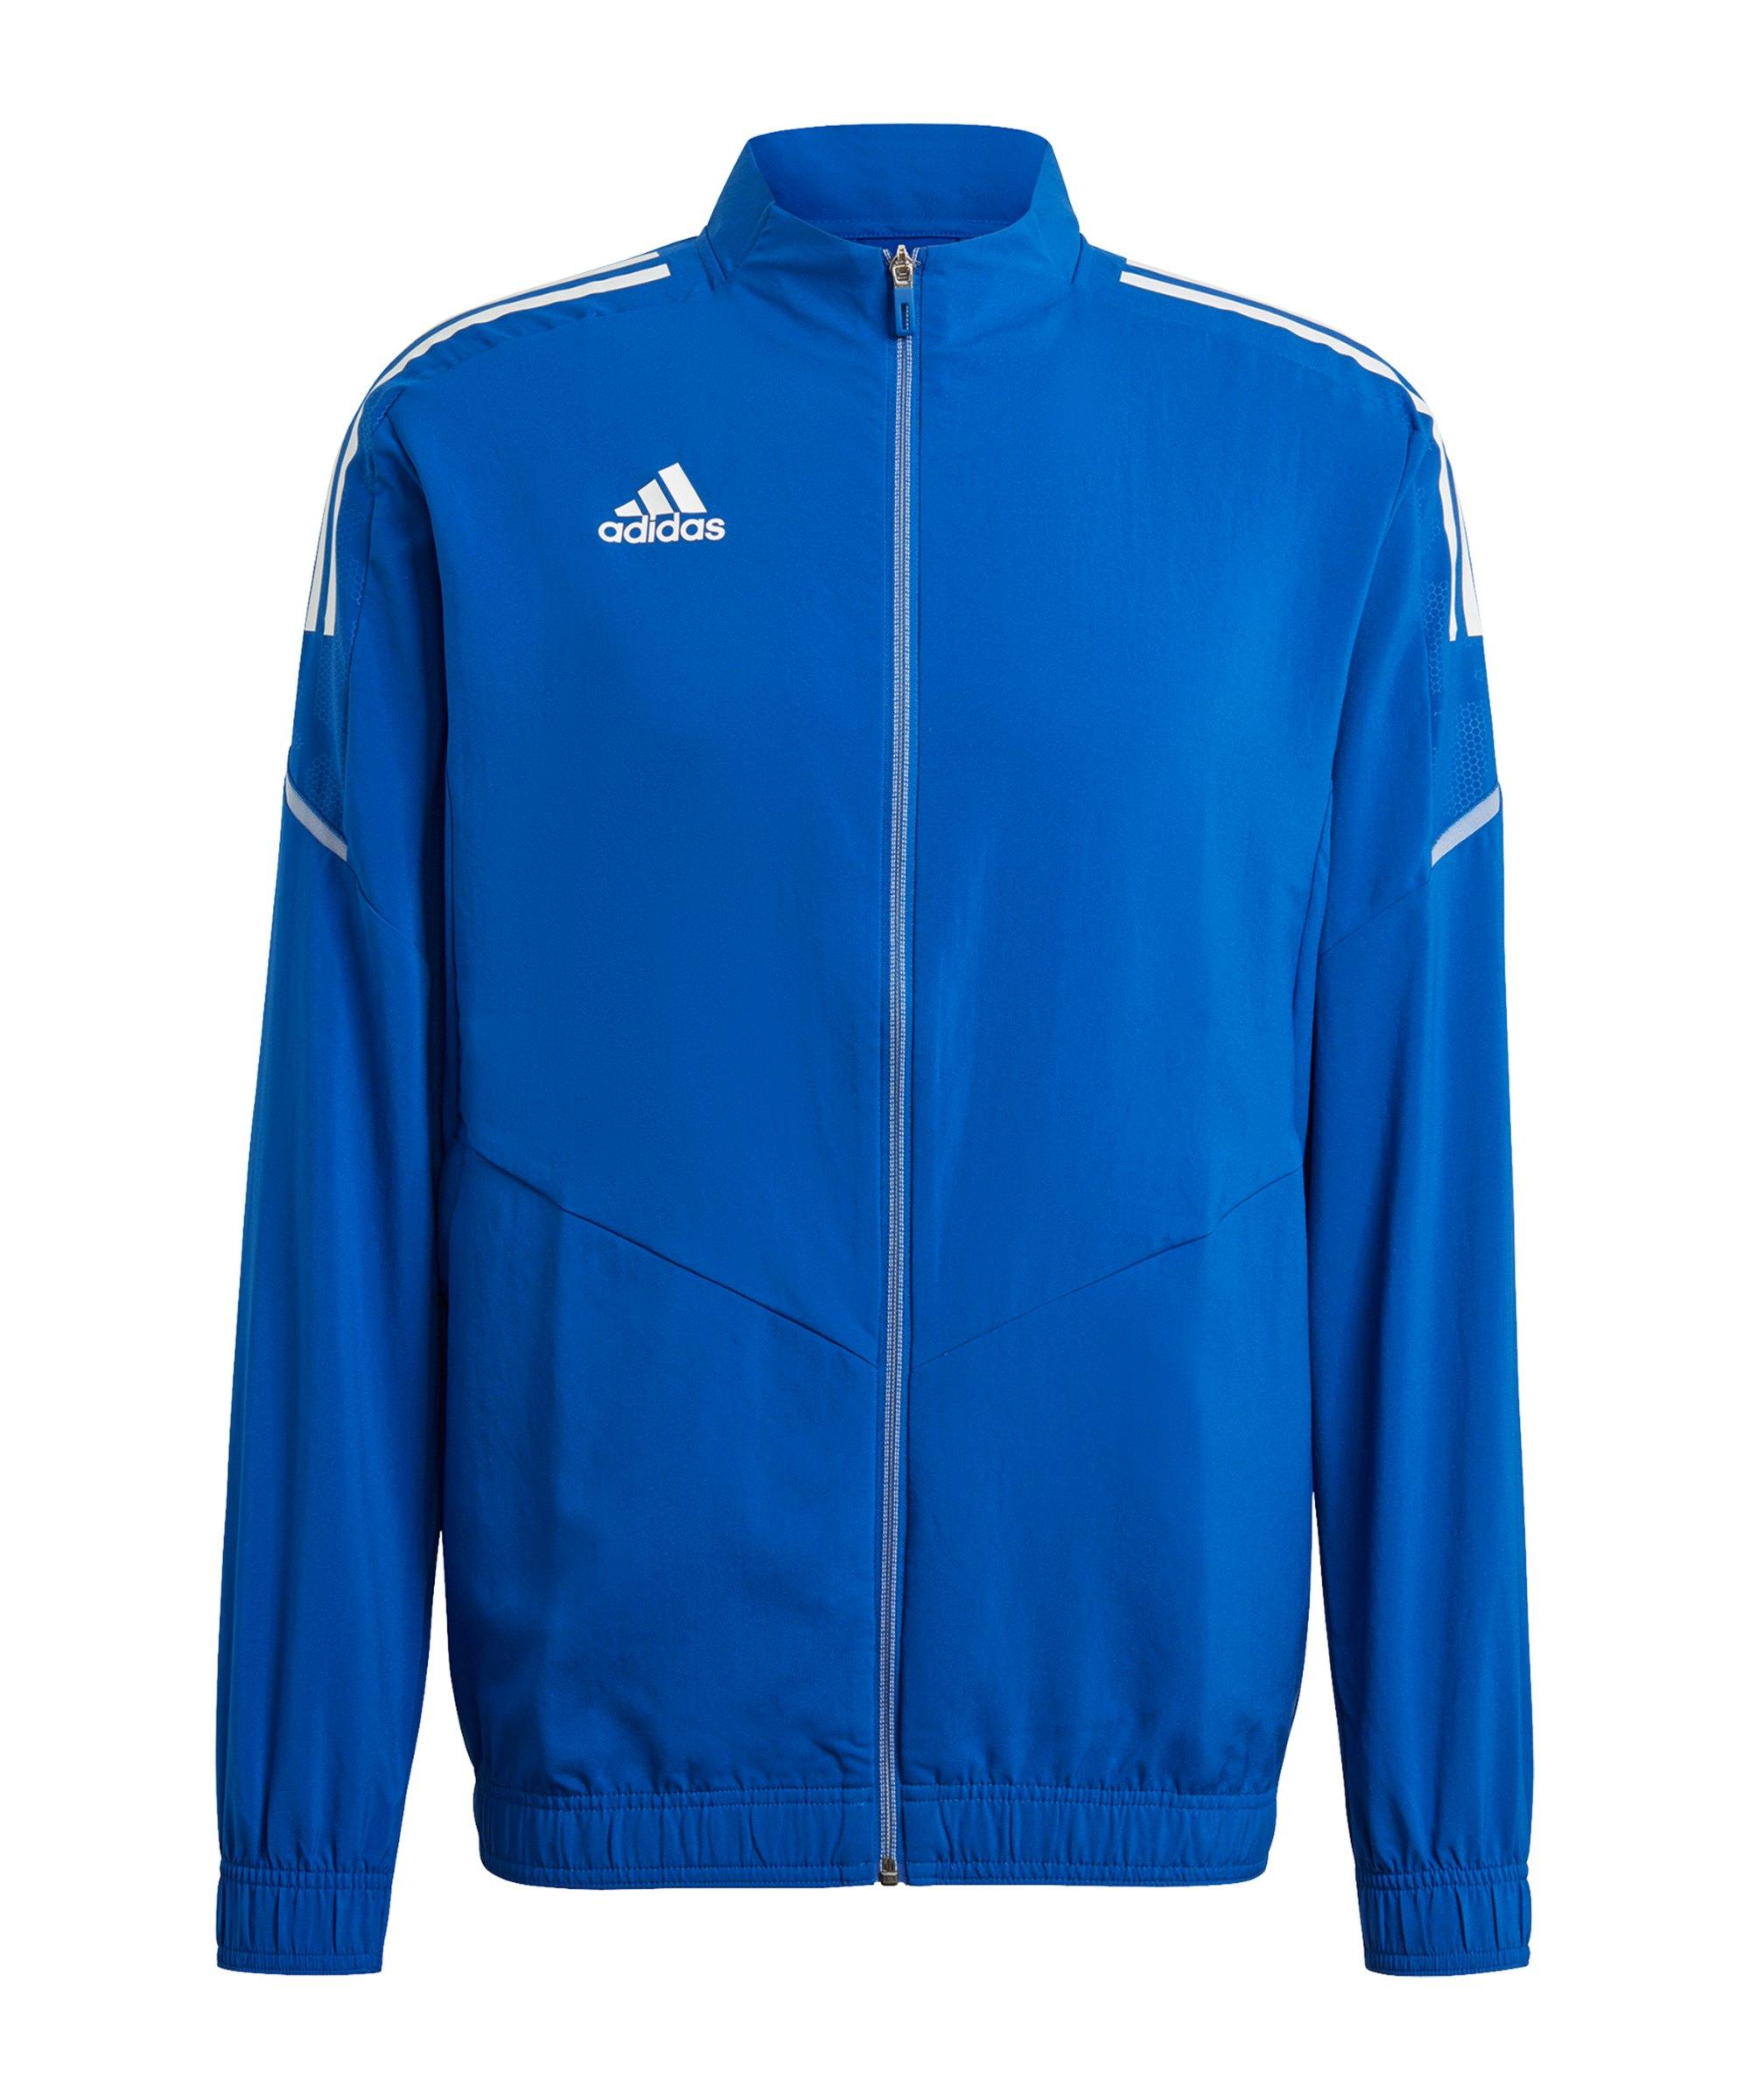 adidas Condivo 21 Präsentationsjacke Blau Weiss - blau